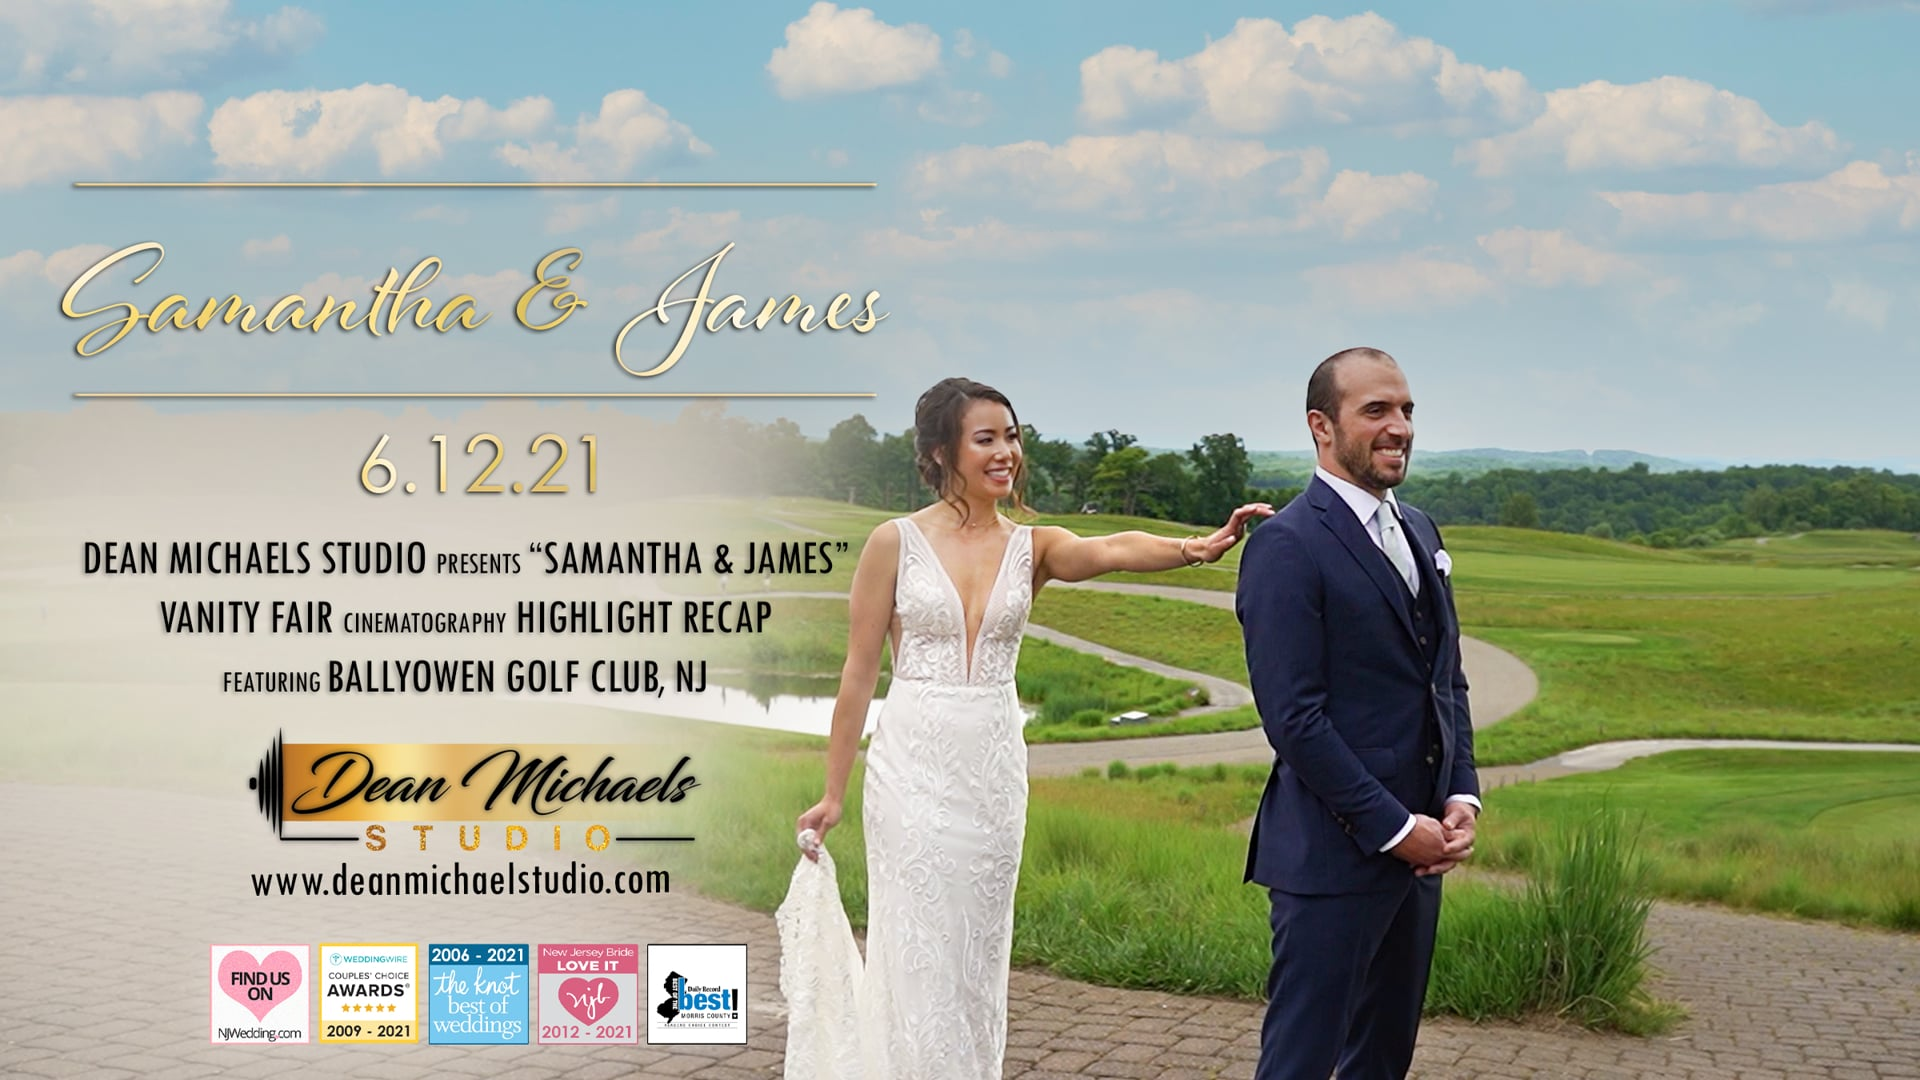 Samantha & James's Wedding Highlight Recap at Ballyowen Golf Club, NJ